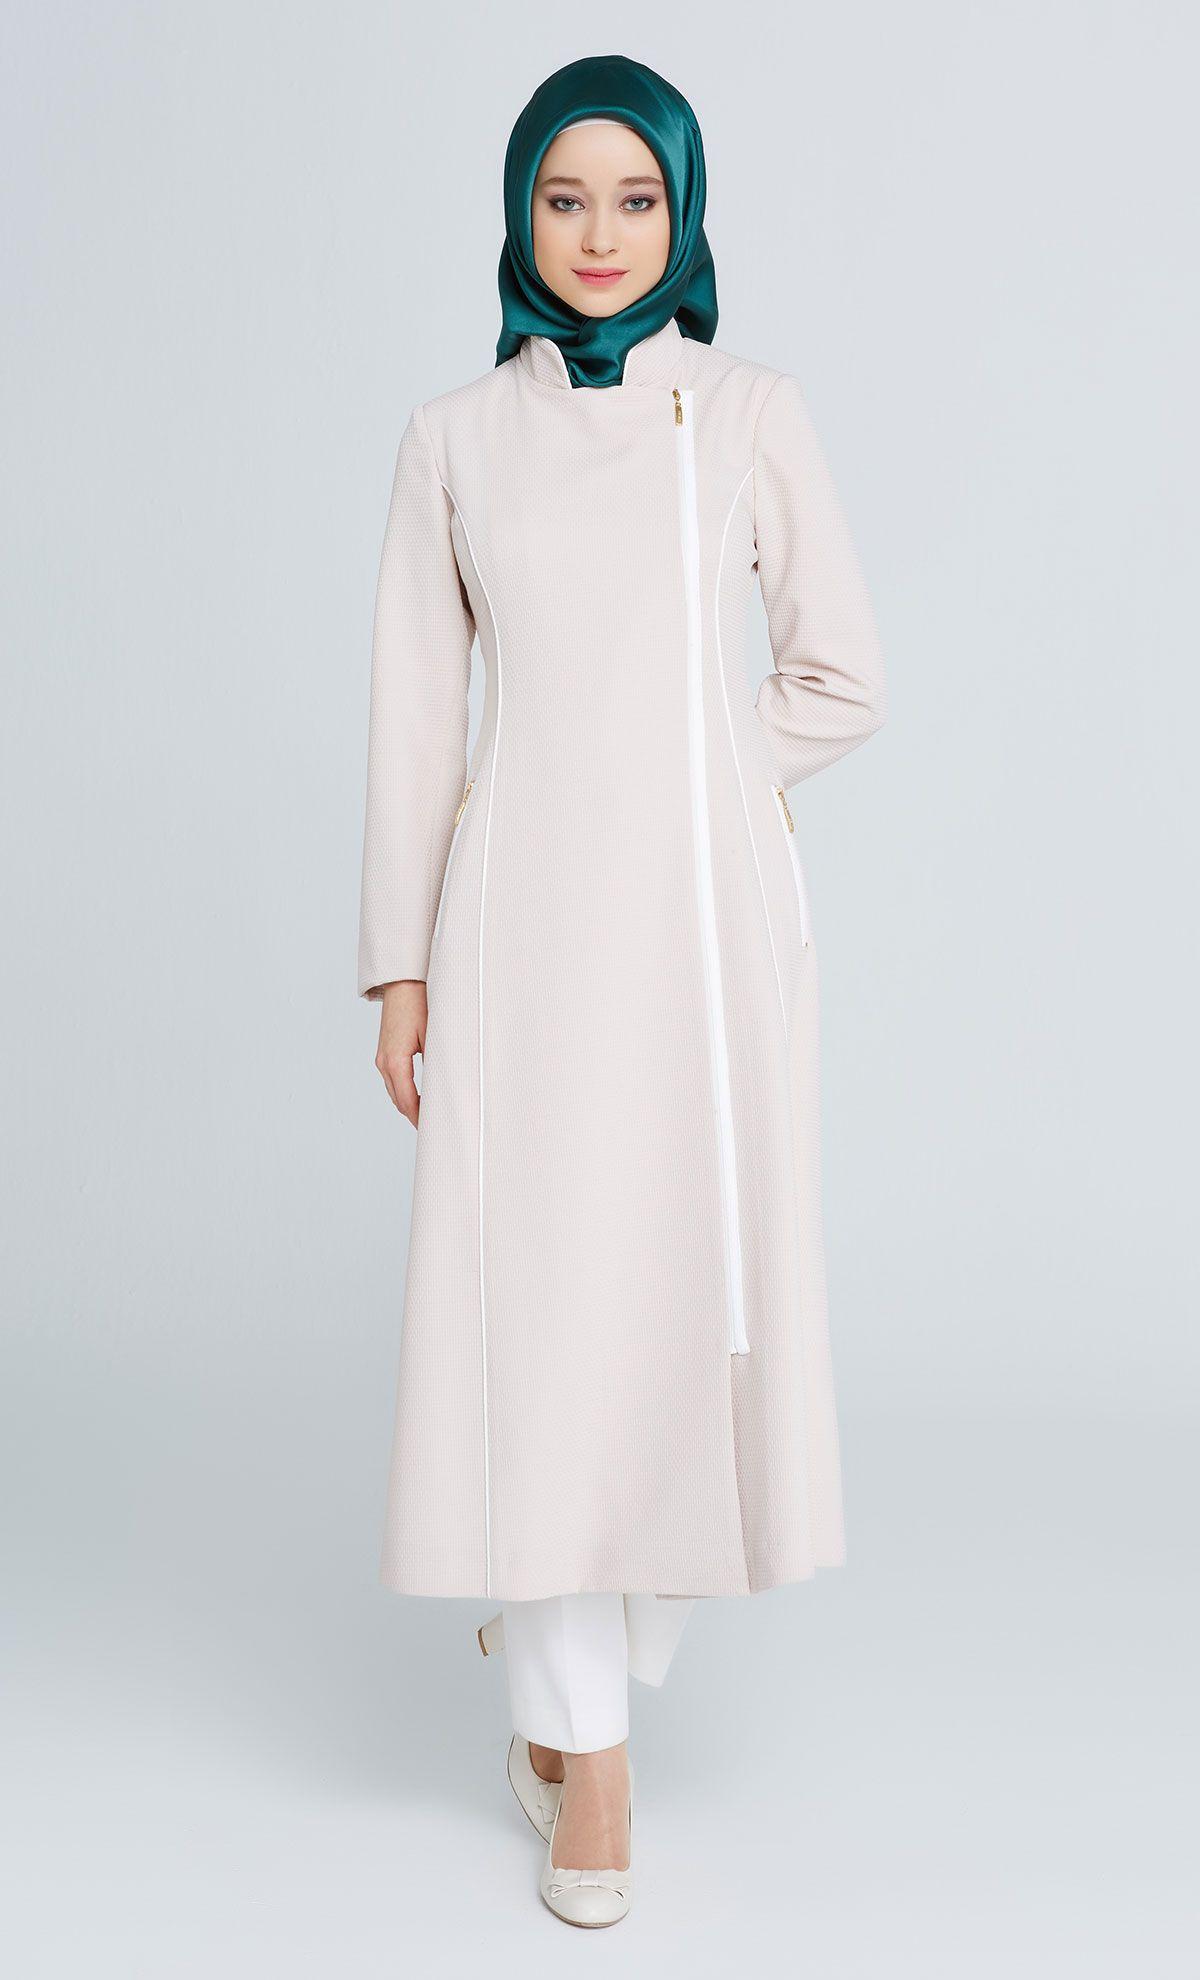 Tugba Store Tesettur Giyim Tesettur Elbise Pardesu Manto Online Alisveris Model Pakaian Hijab Ilustrasi Model Pakaian Model Pakaian